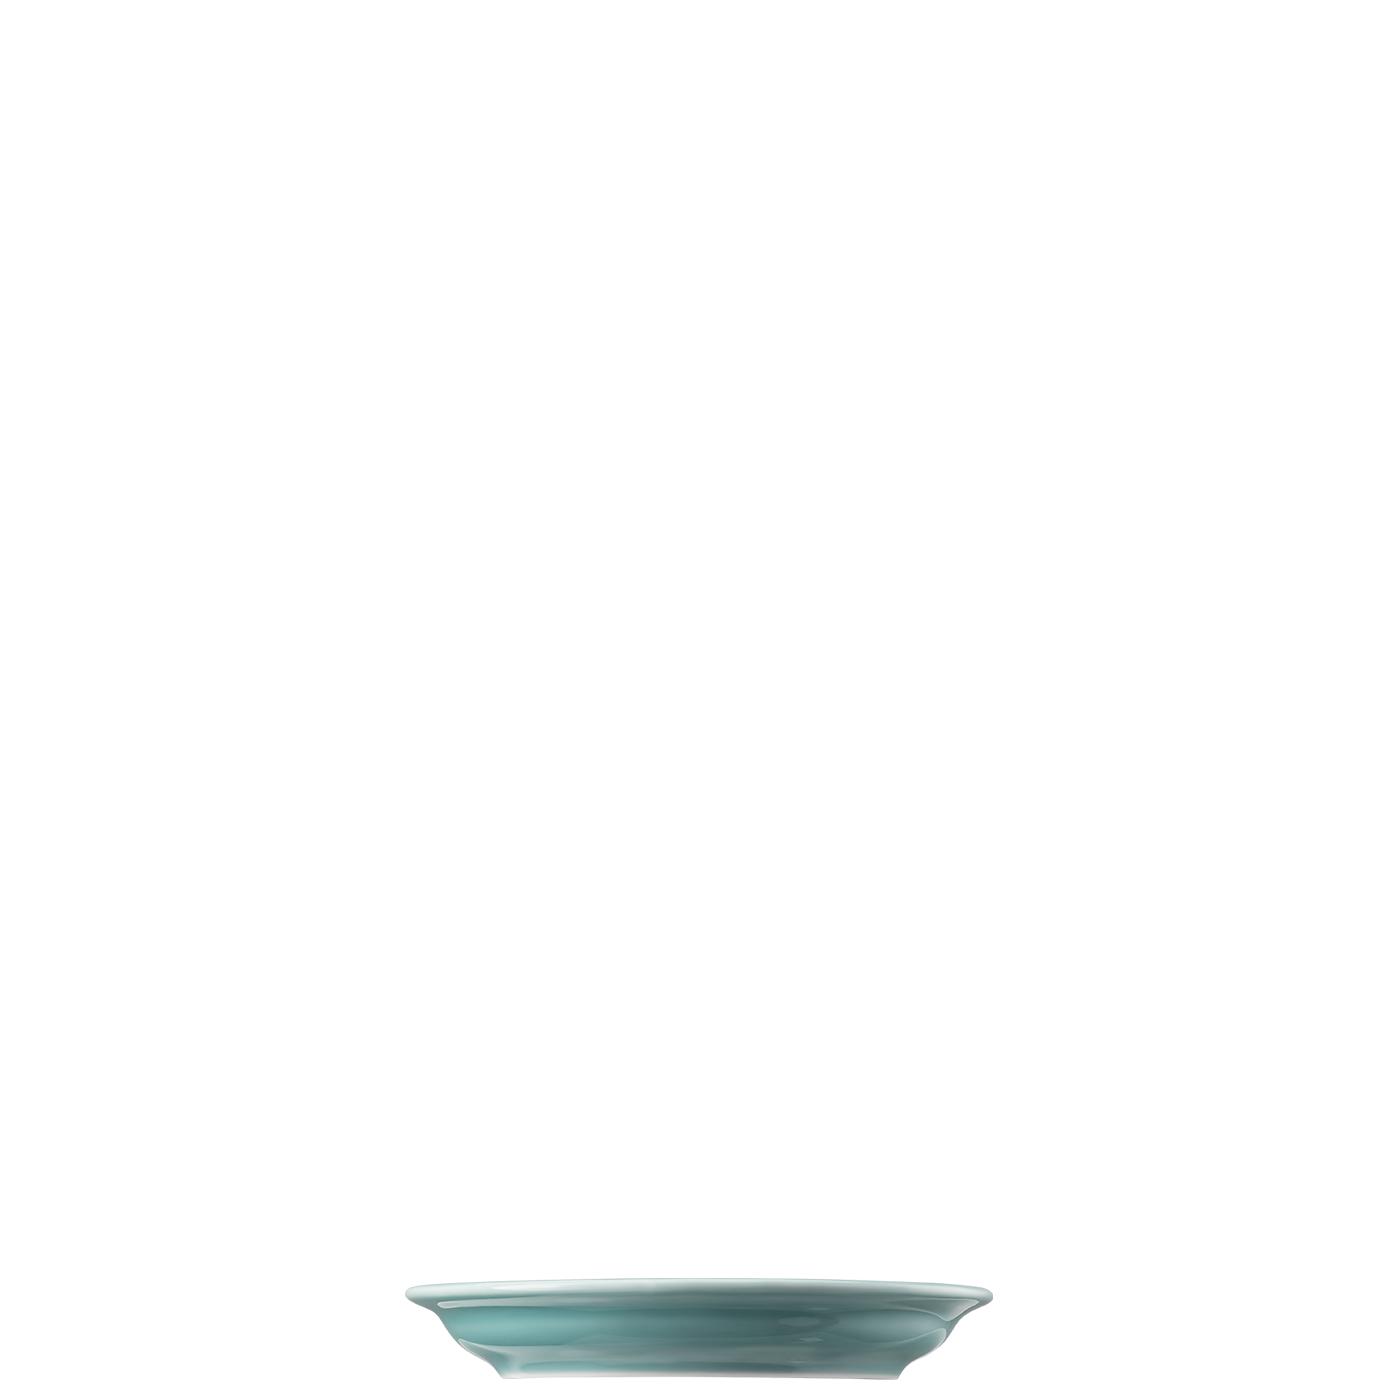 Kaffee-Untertasse Trend Colour Ice Blue Thomas Porzellan